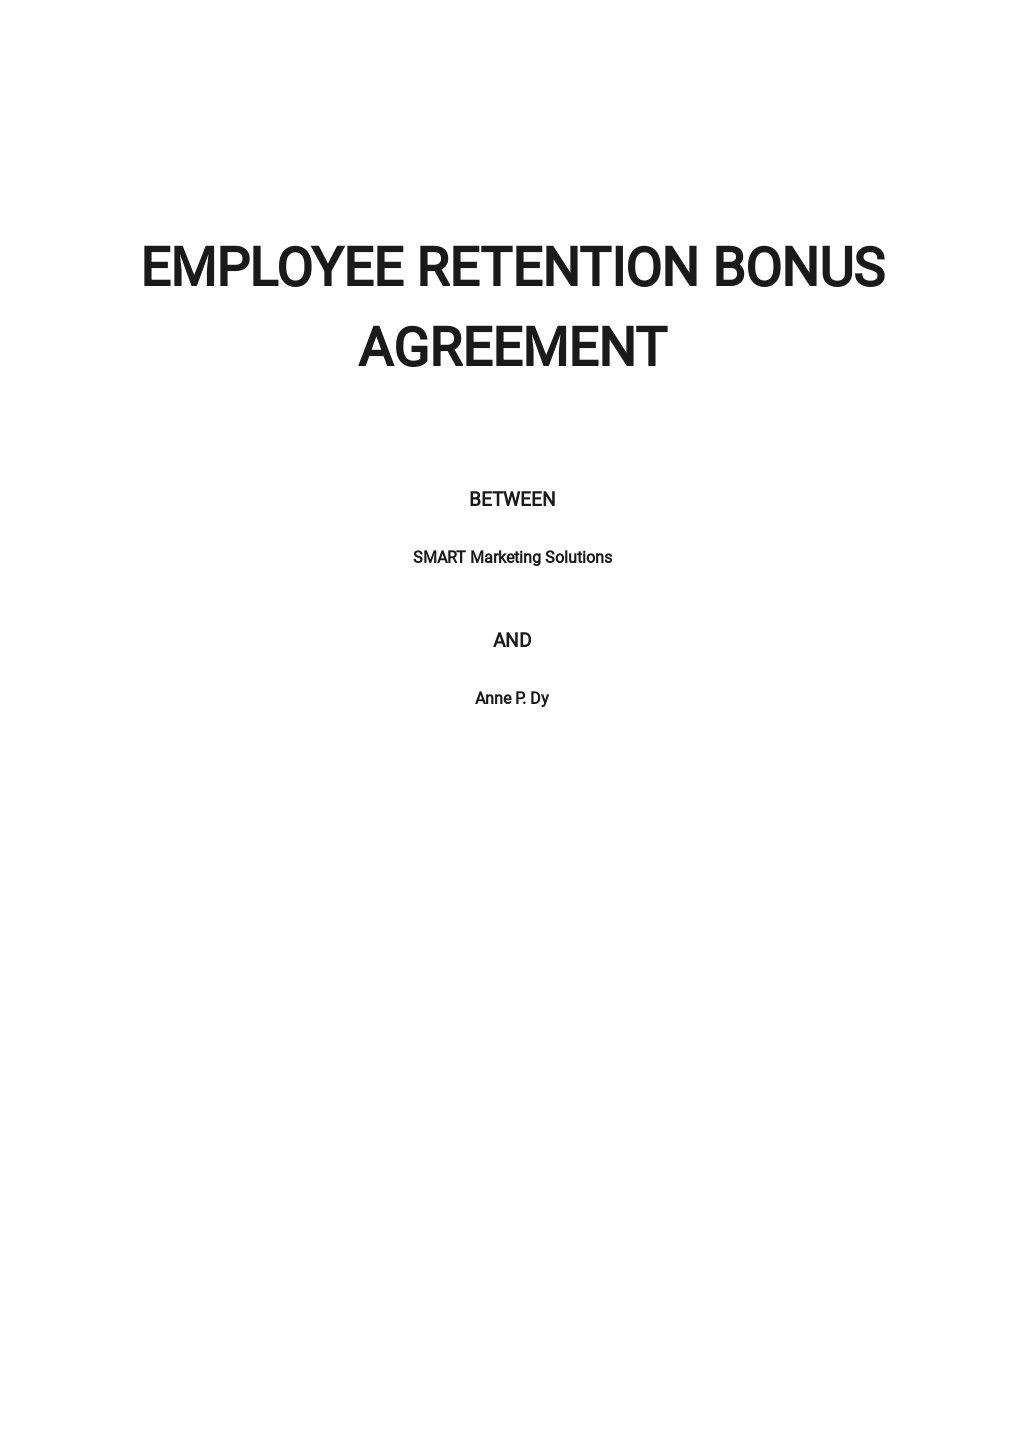 Employee Retention Bonus Agreement Template.jpe